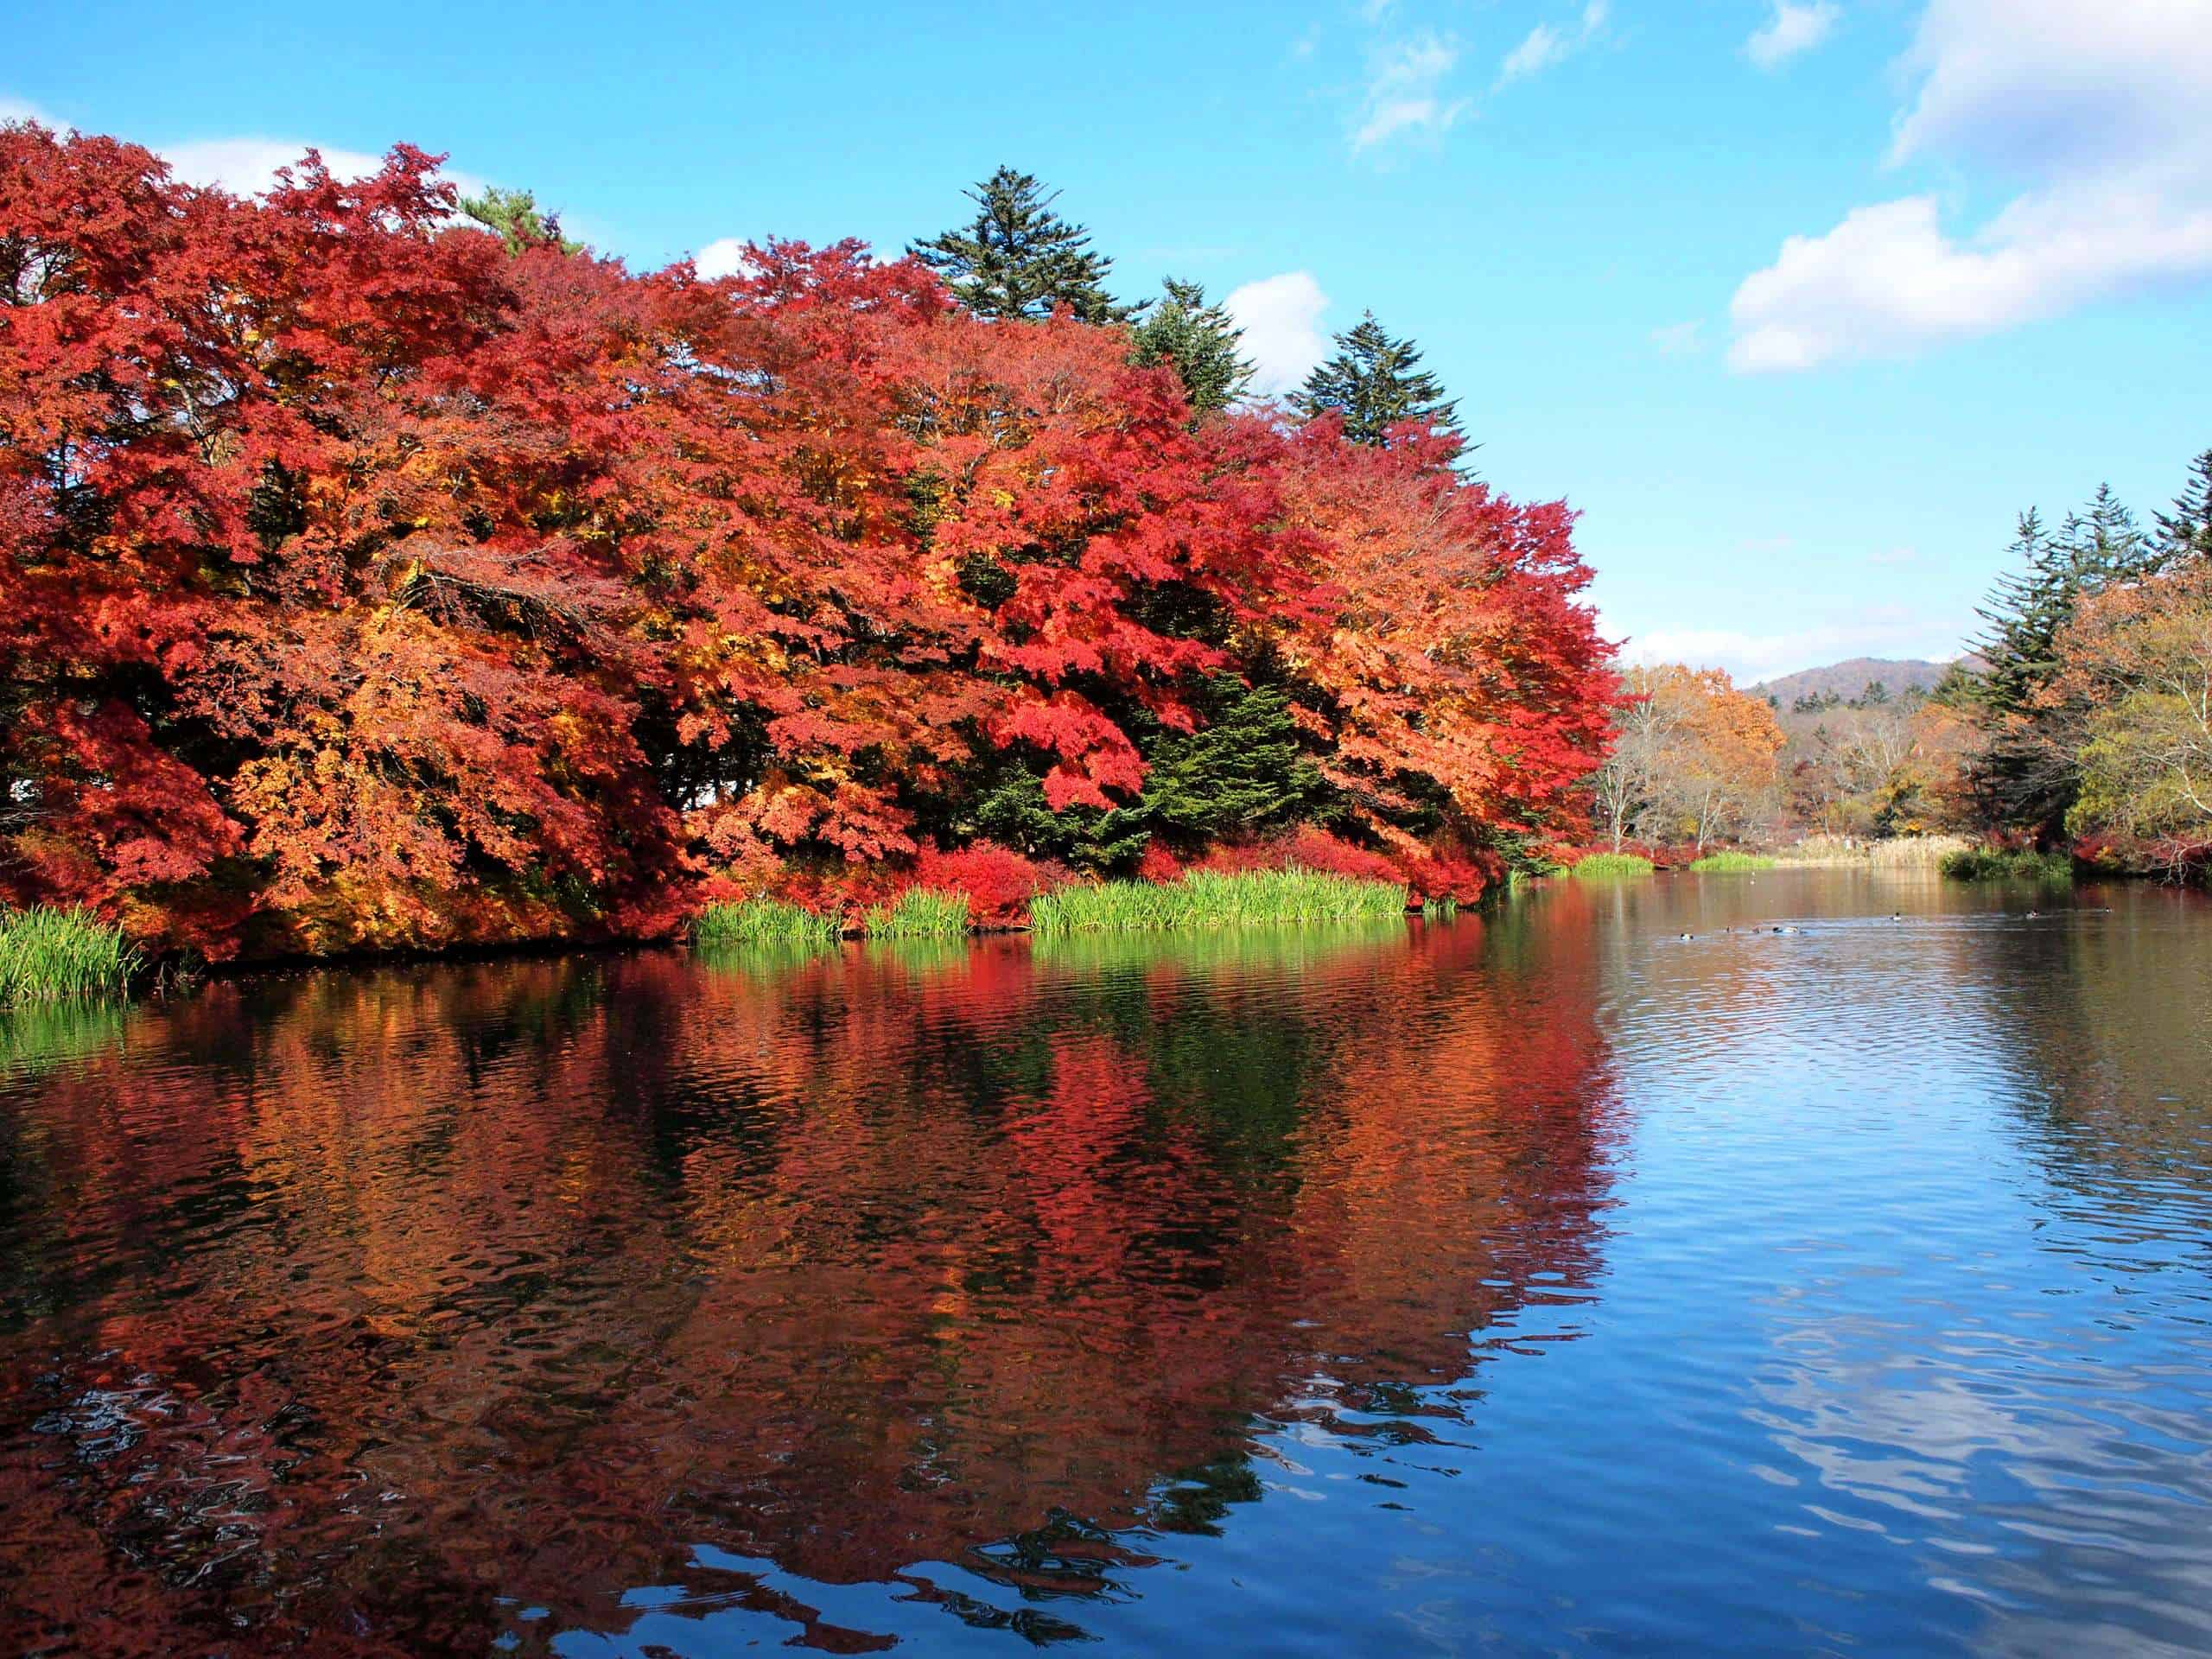 Kumoba Pond ช่วงฤดูใบไม้ผลิ คารุอิซาวะ (Karuizawa) จ.นากาโน่ (Nagano)